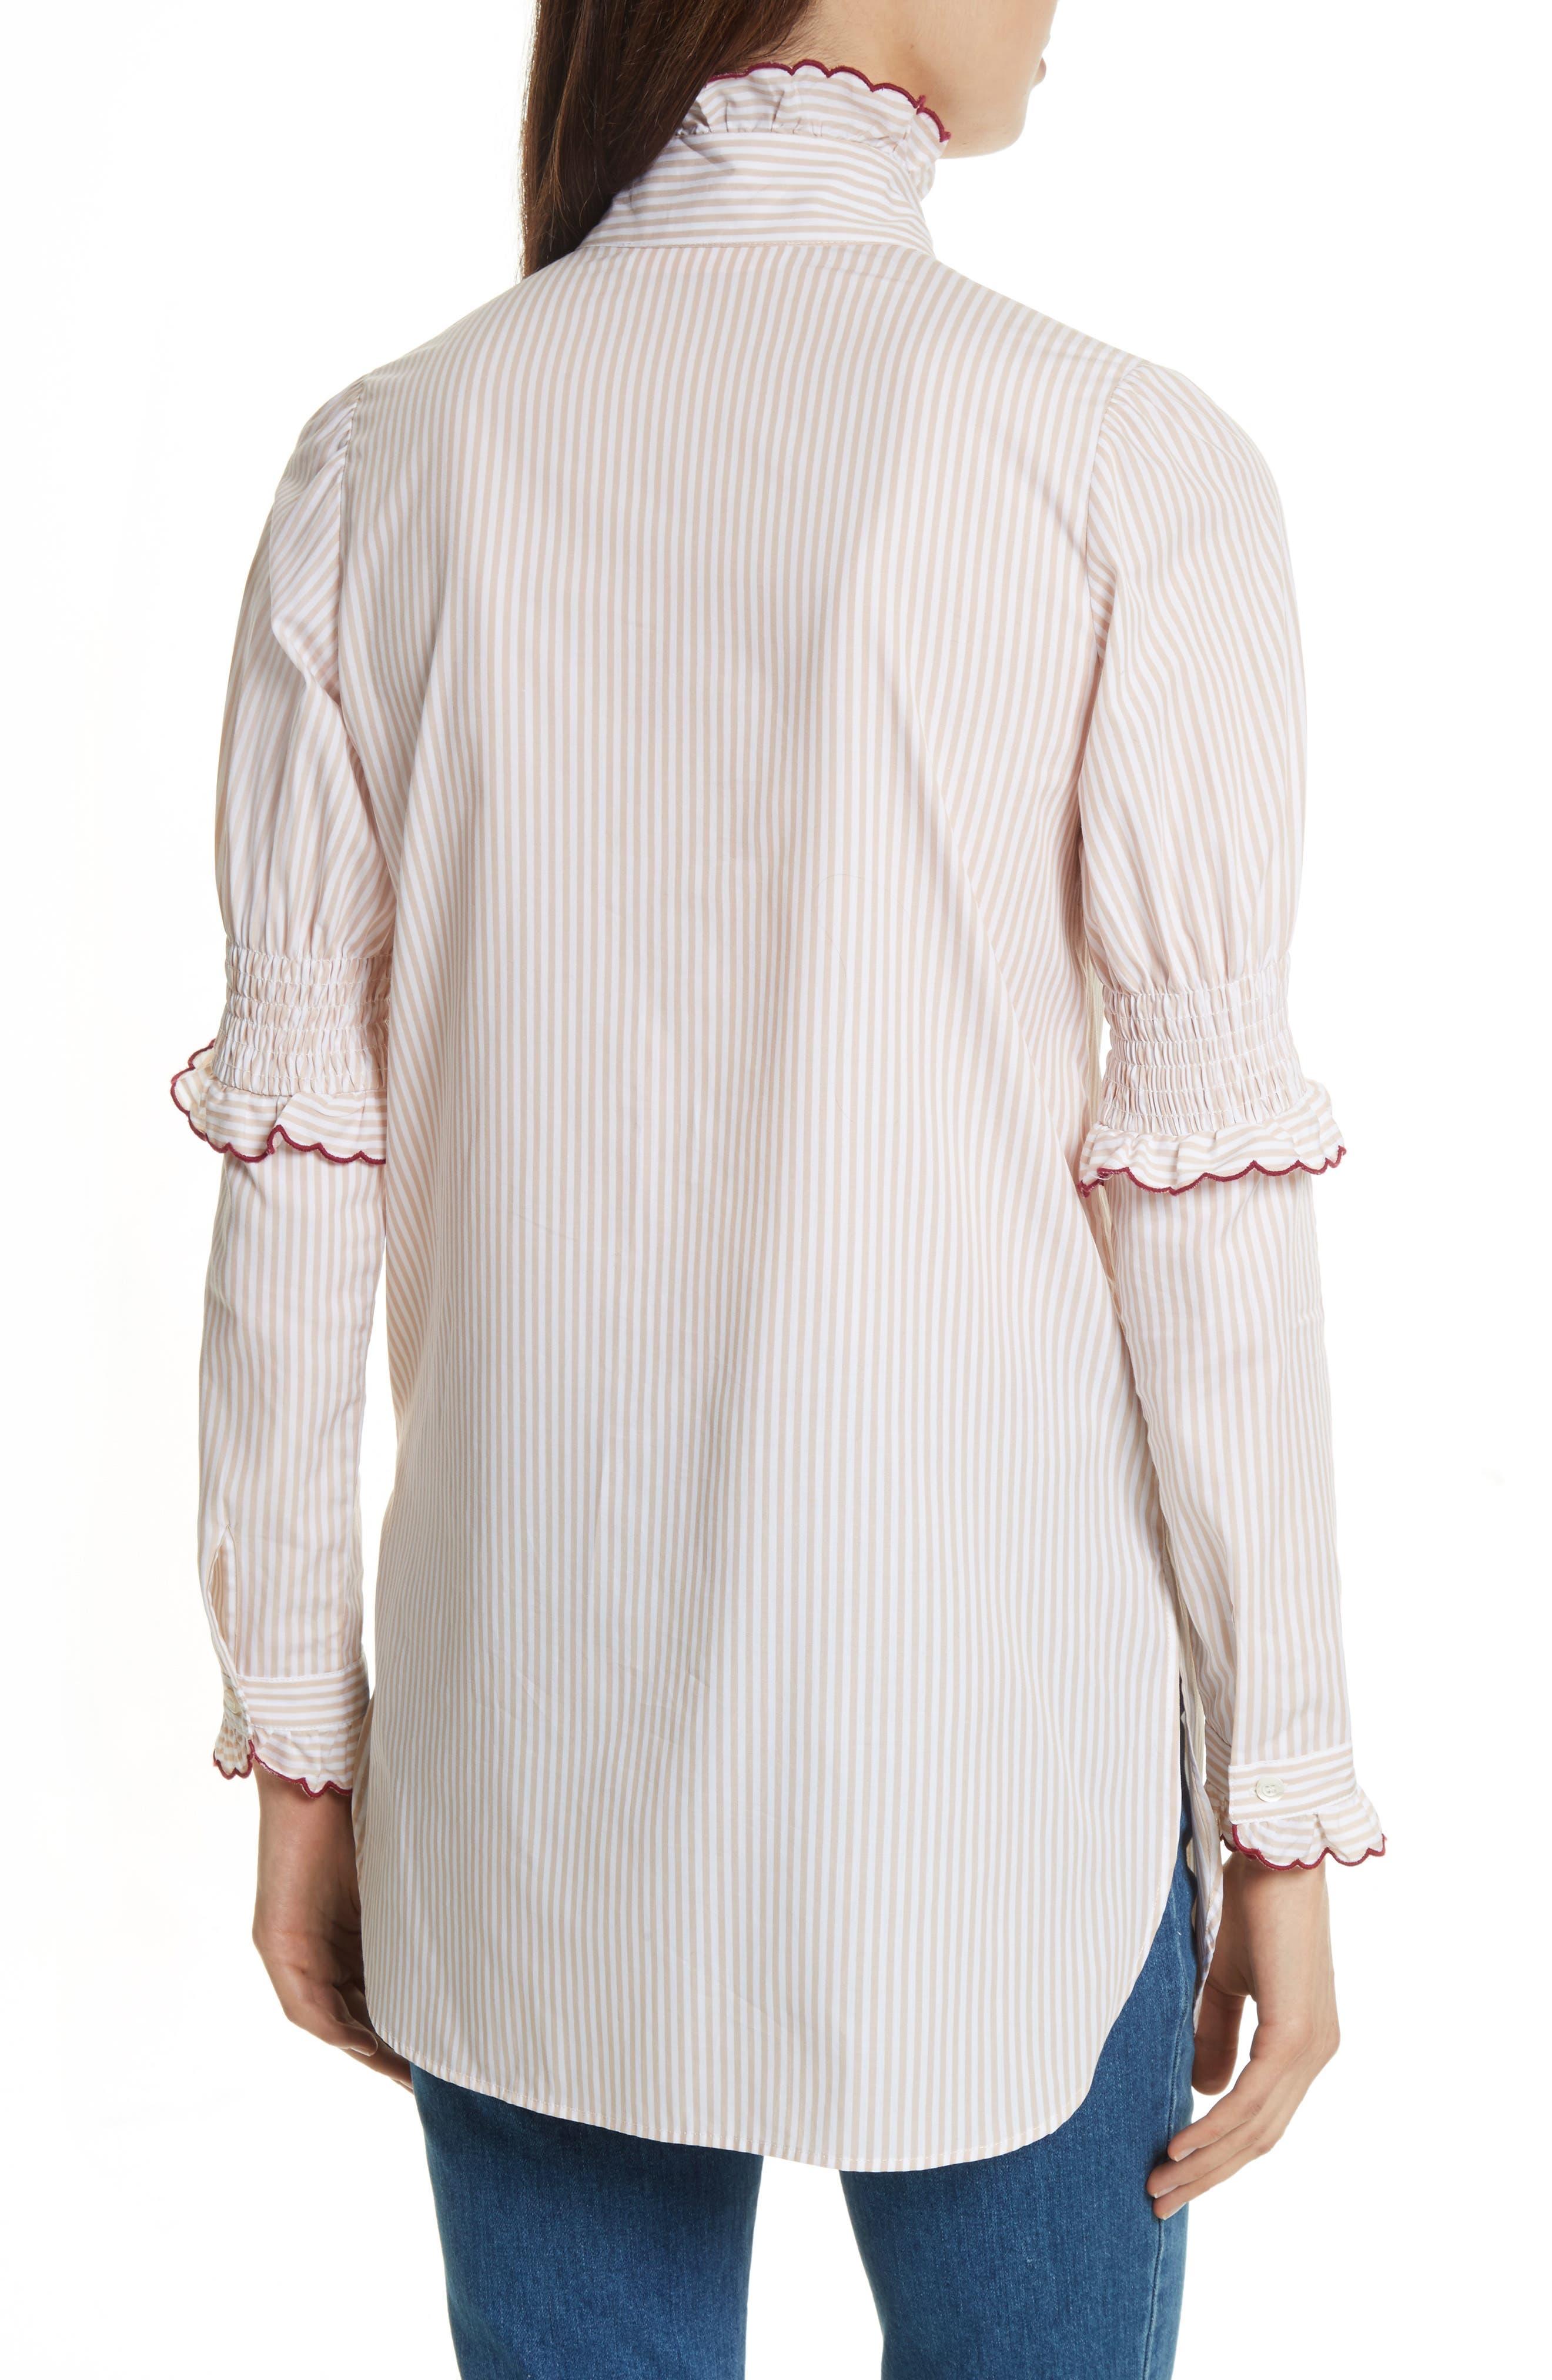 Stripe Cotton Shirt,                             Alternate thumbnail 2, color,                             Beige-White